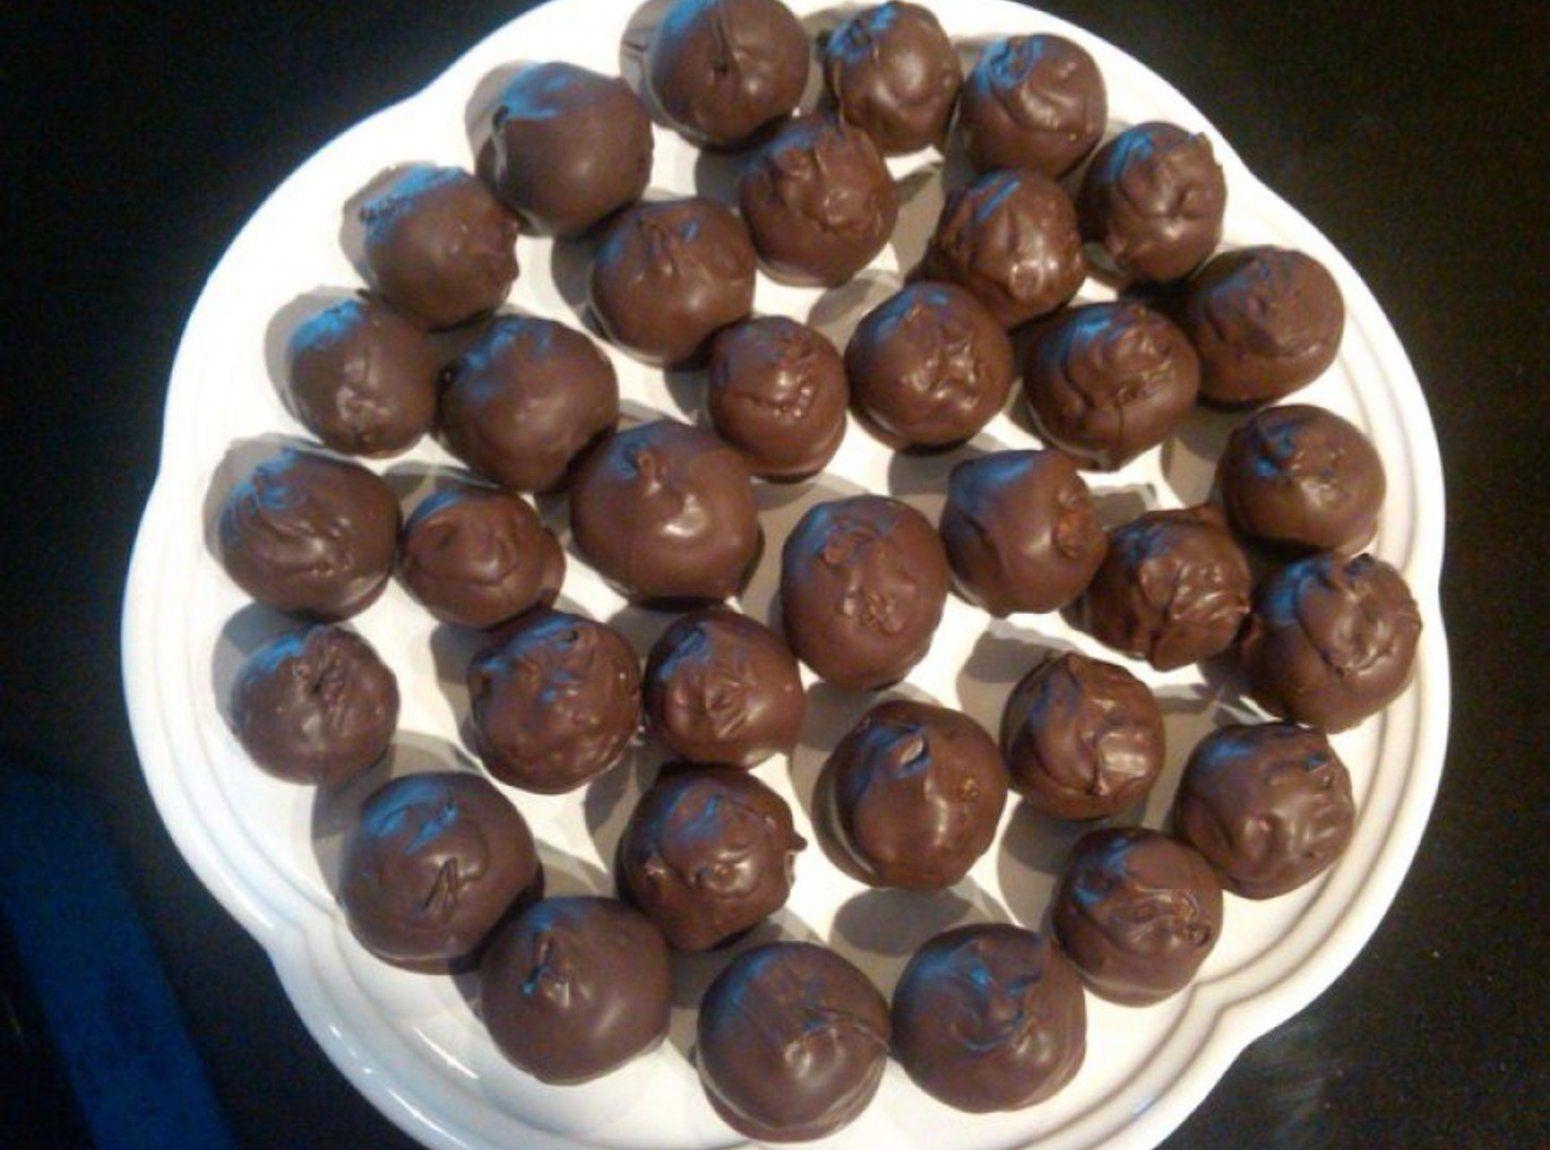 PECAN PIE BALLS - no bake & chocolate covered!